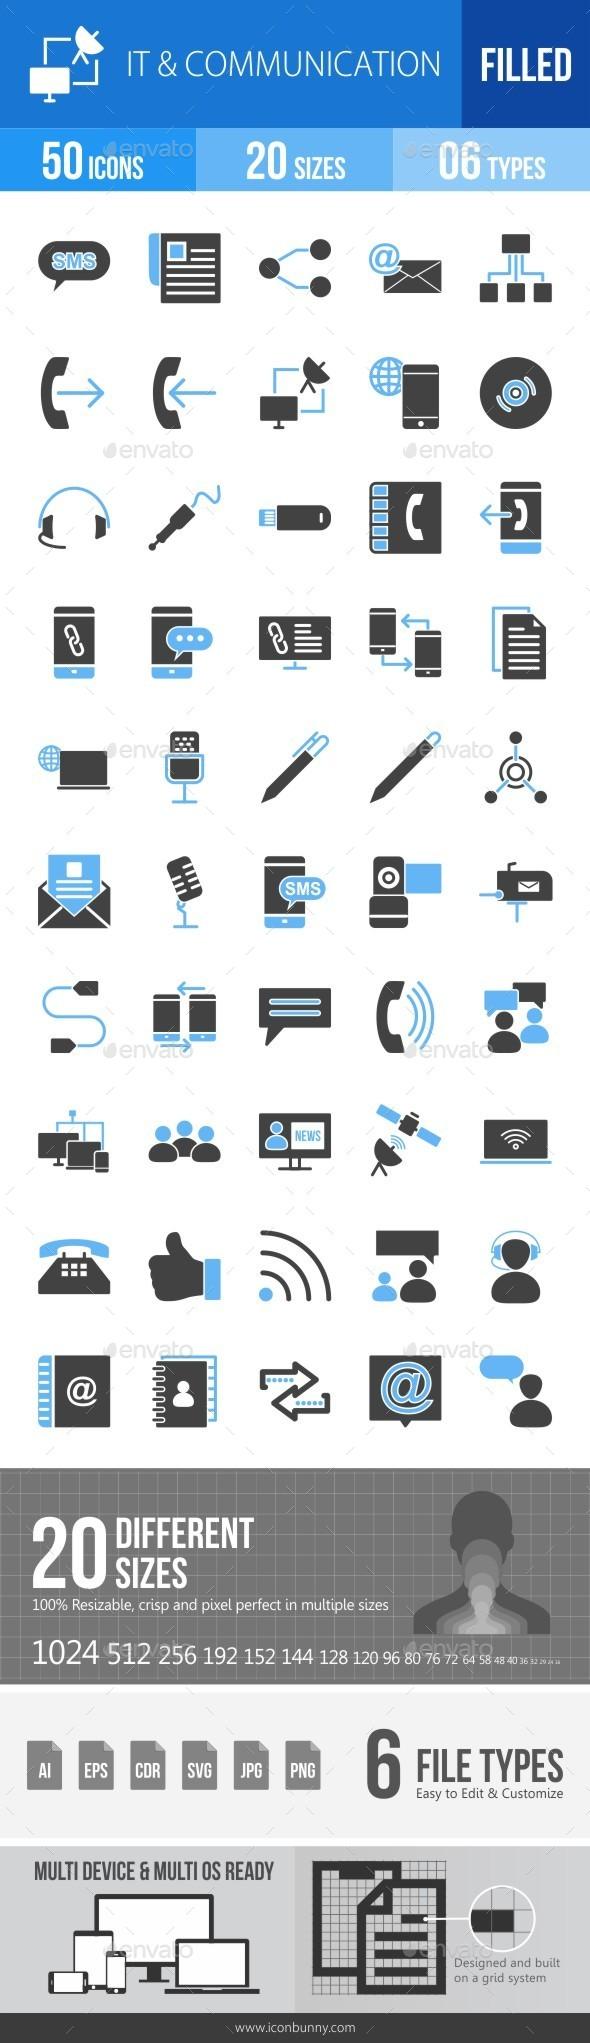 IT & Communication Blue & Black Icons - Icons